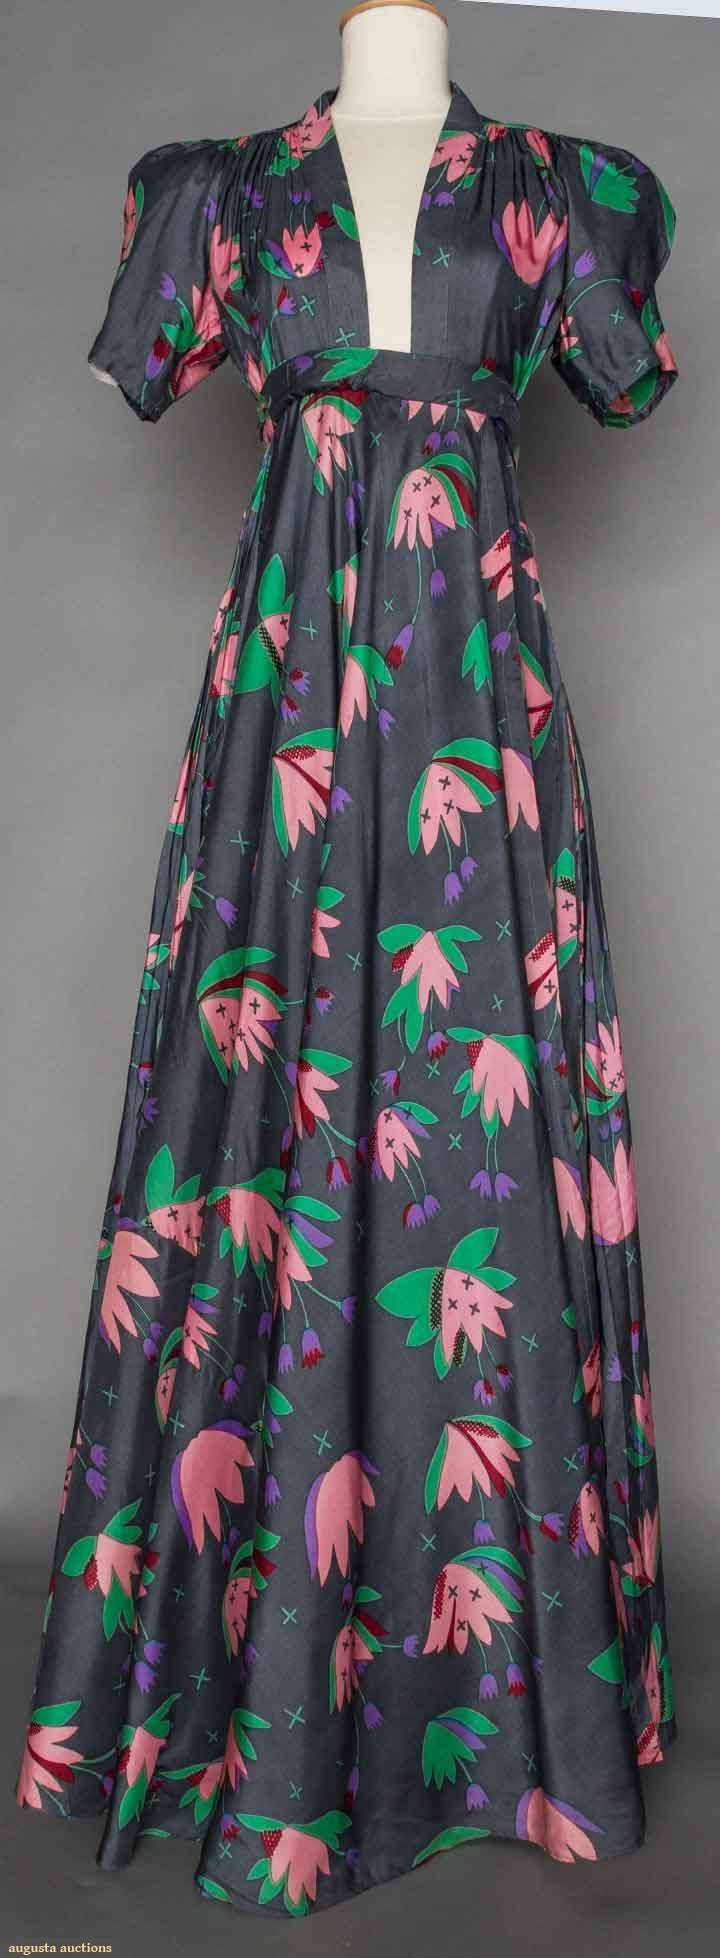 Ossie Clark/celia Birtwell Printed Dress, 1970, Augusta Auctions, November 11, 2015 NYC